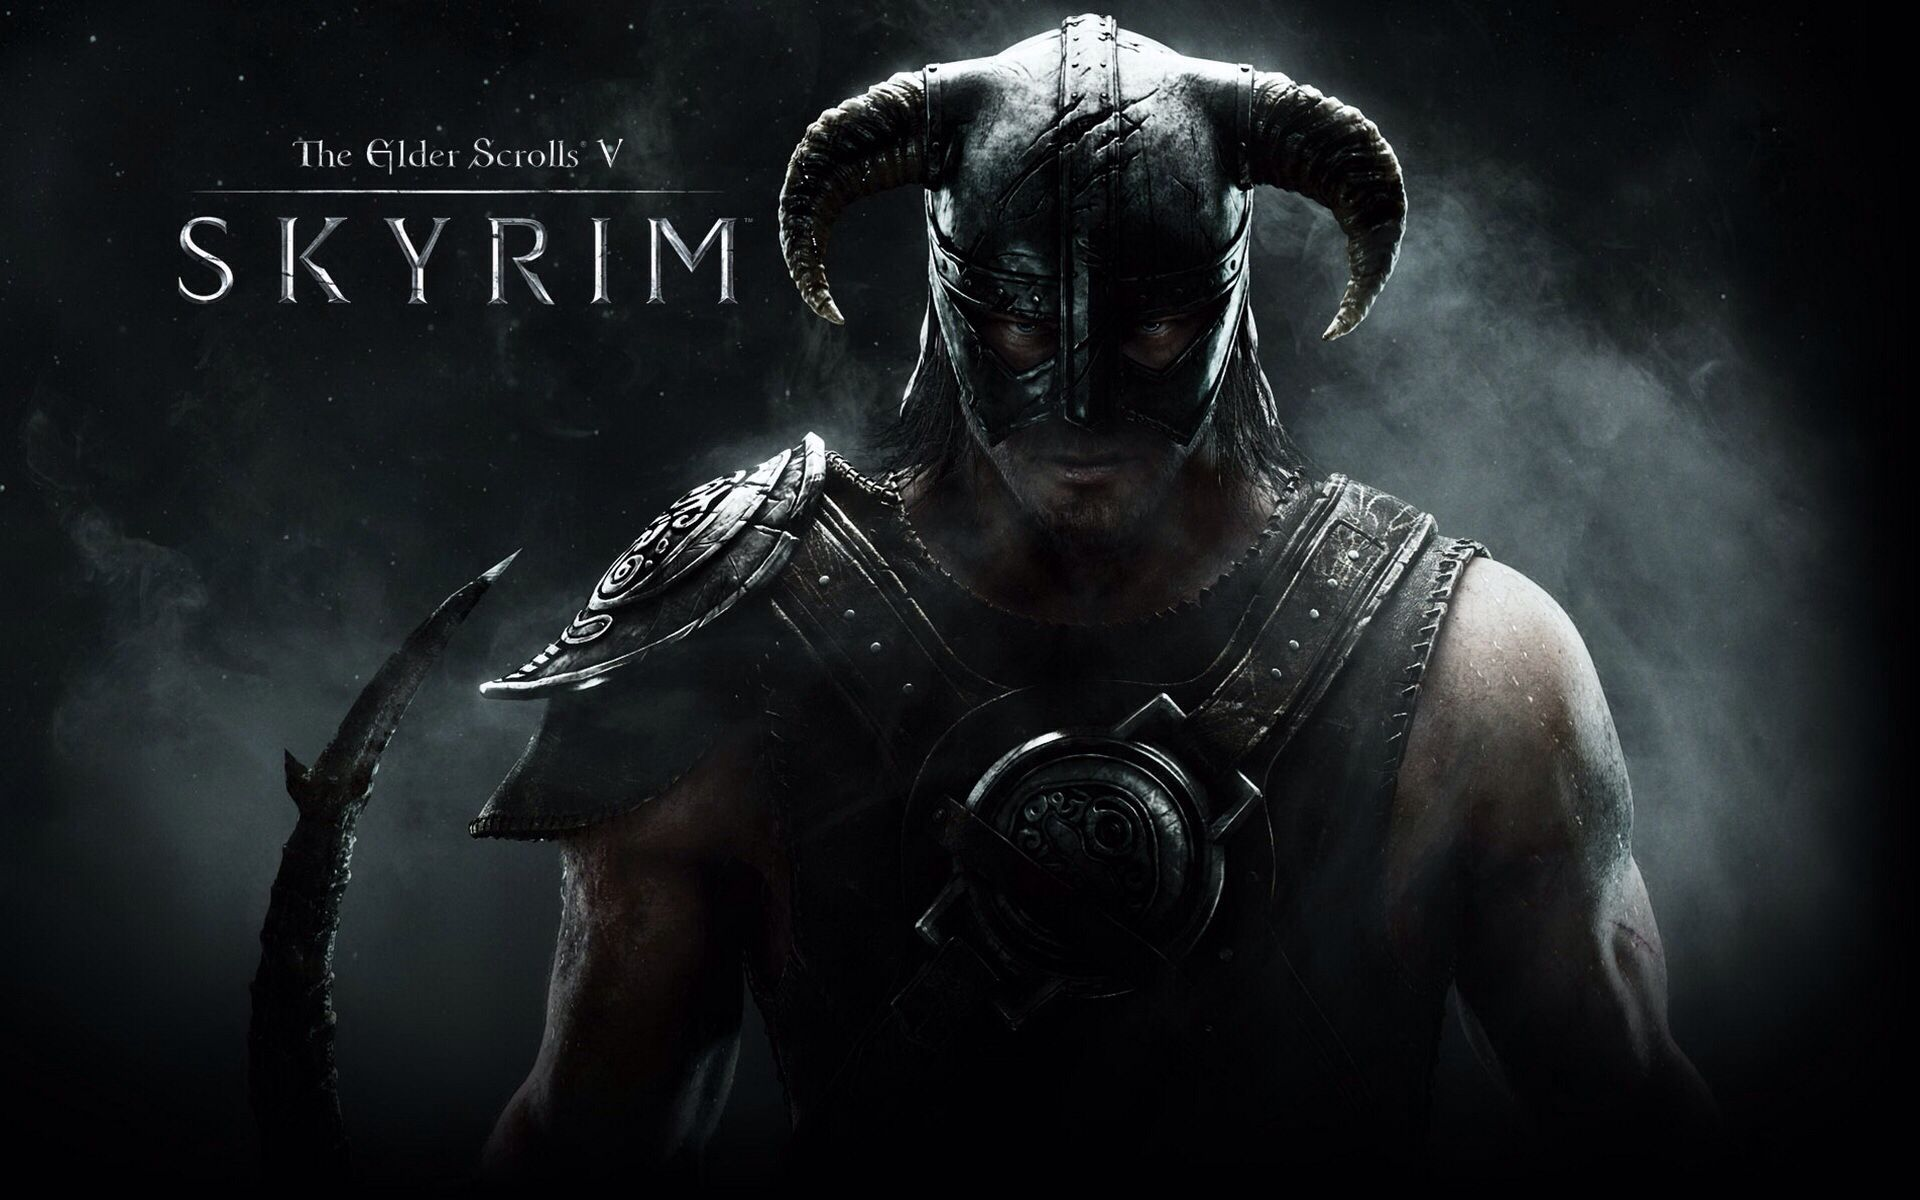 TES: Skyrim, my fav game all time